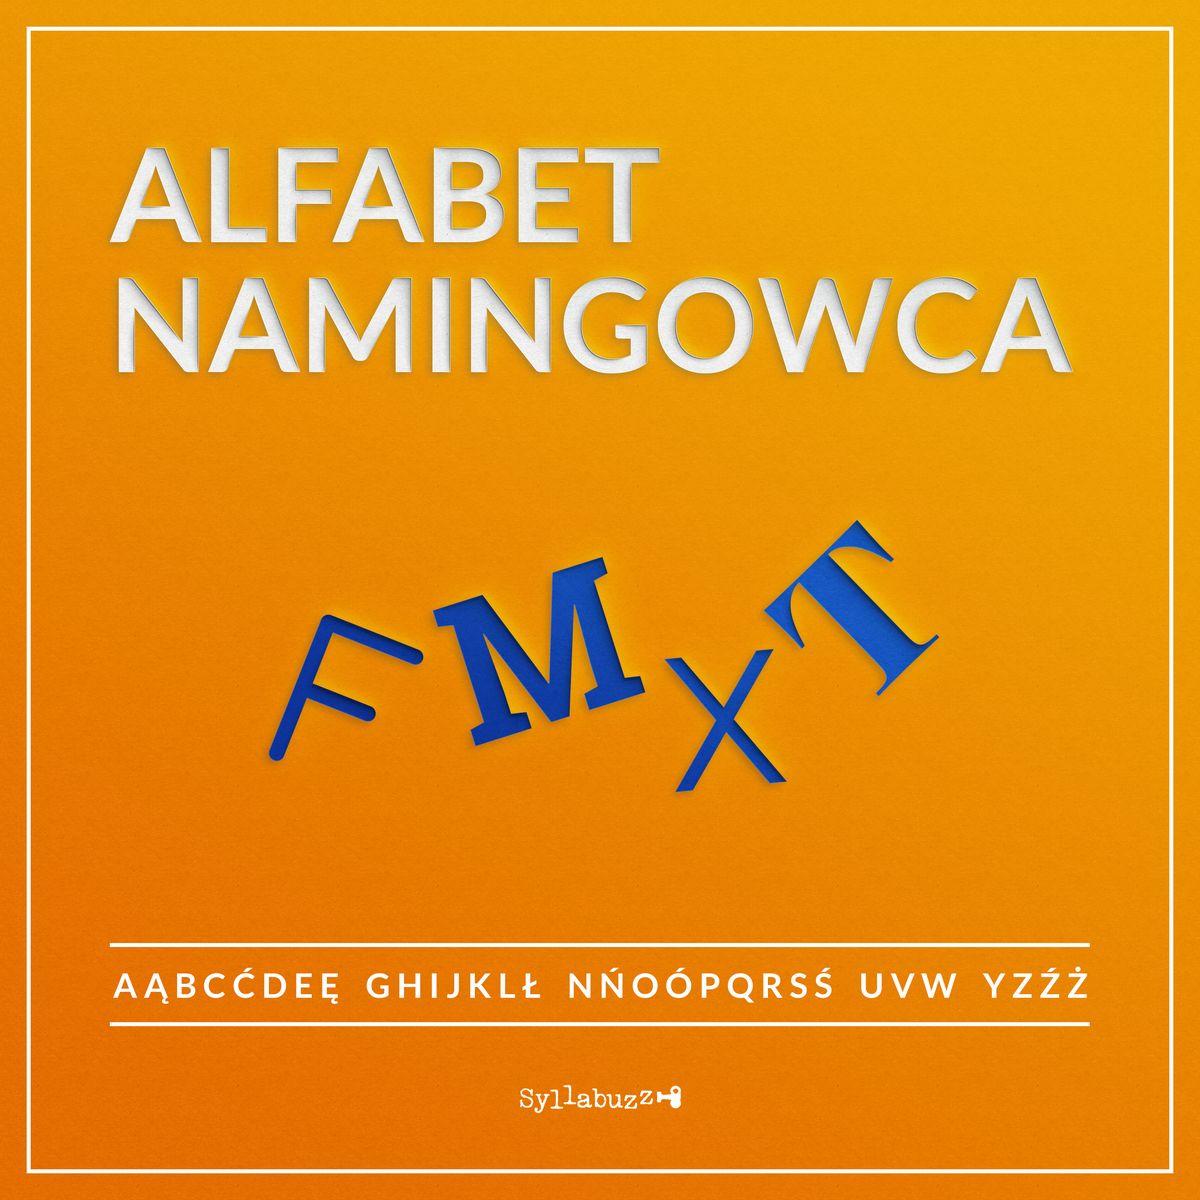 Alfabet namingowca F M T X, Konrad Gurdak, Syllabuzz.pl, agencja namingowa